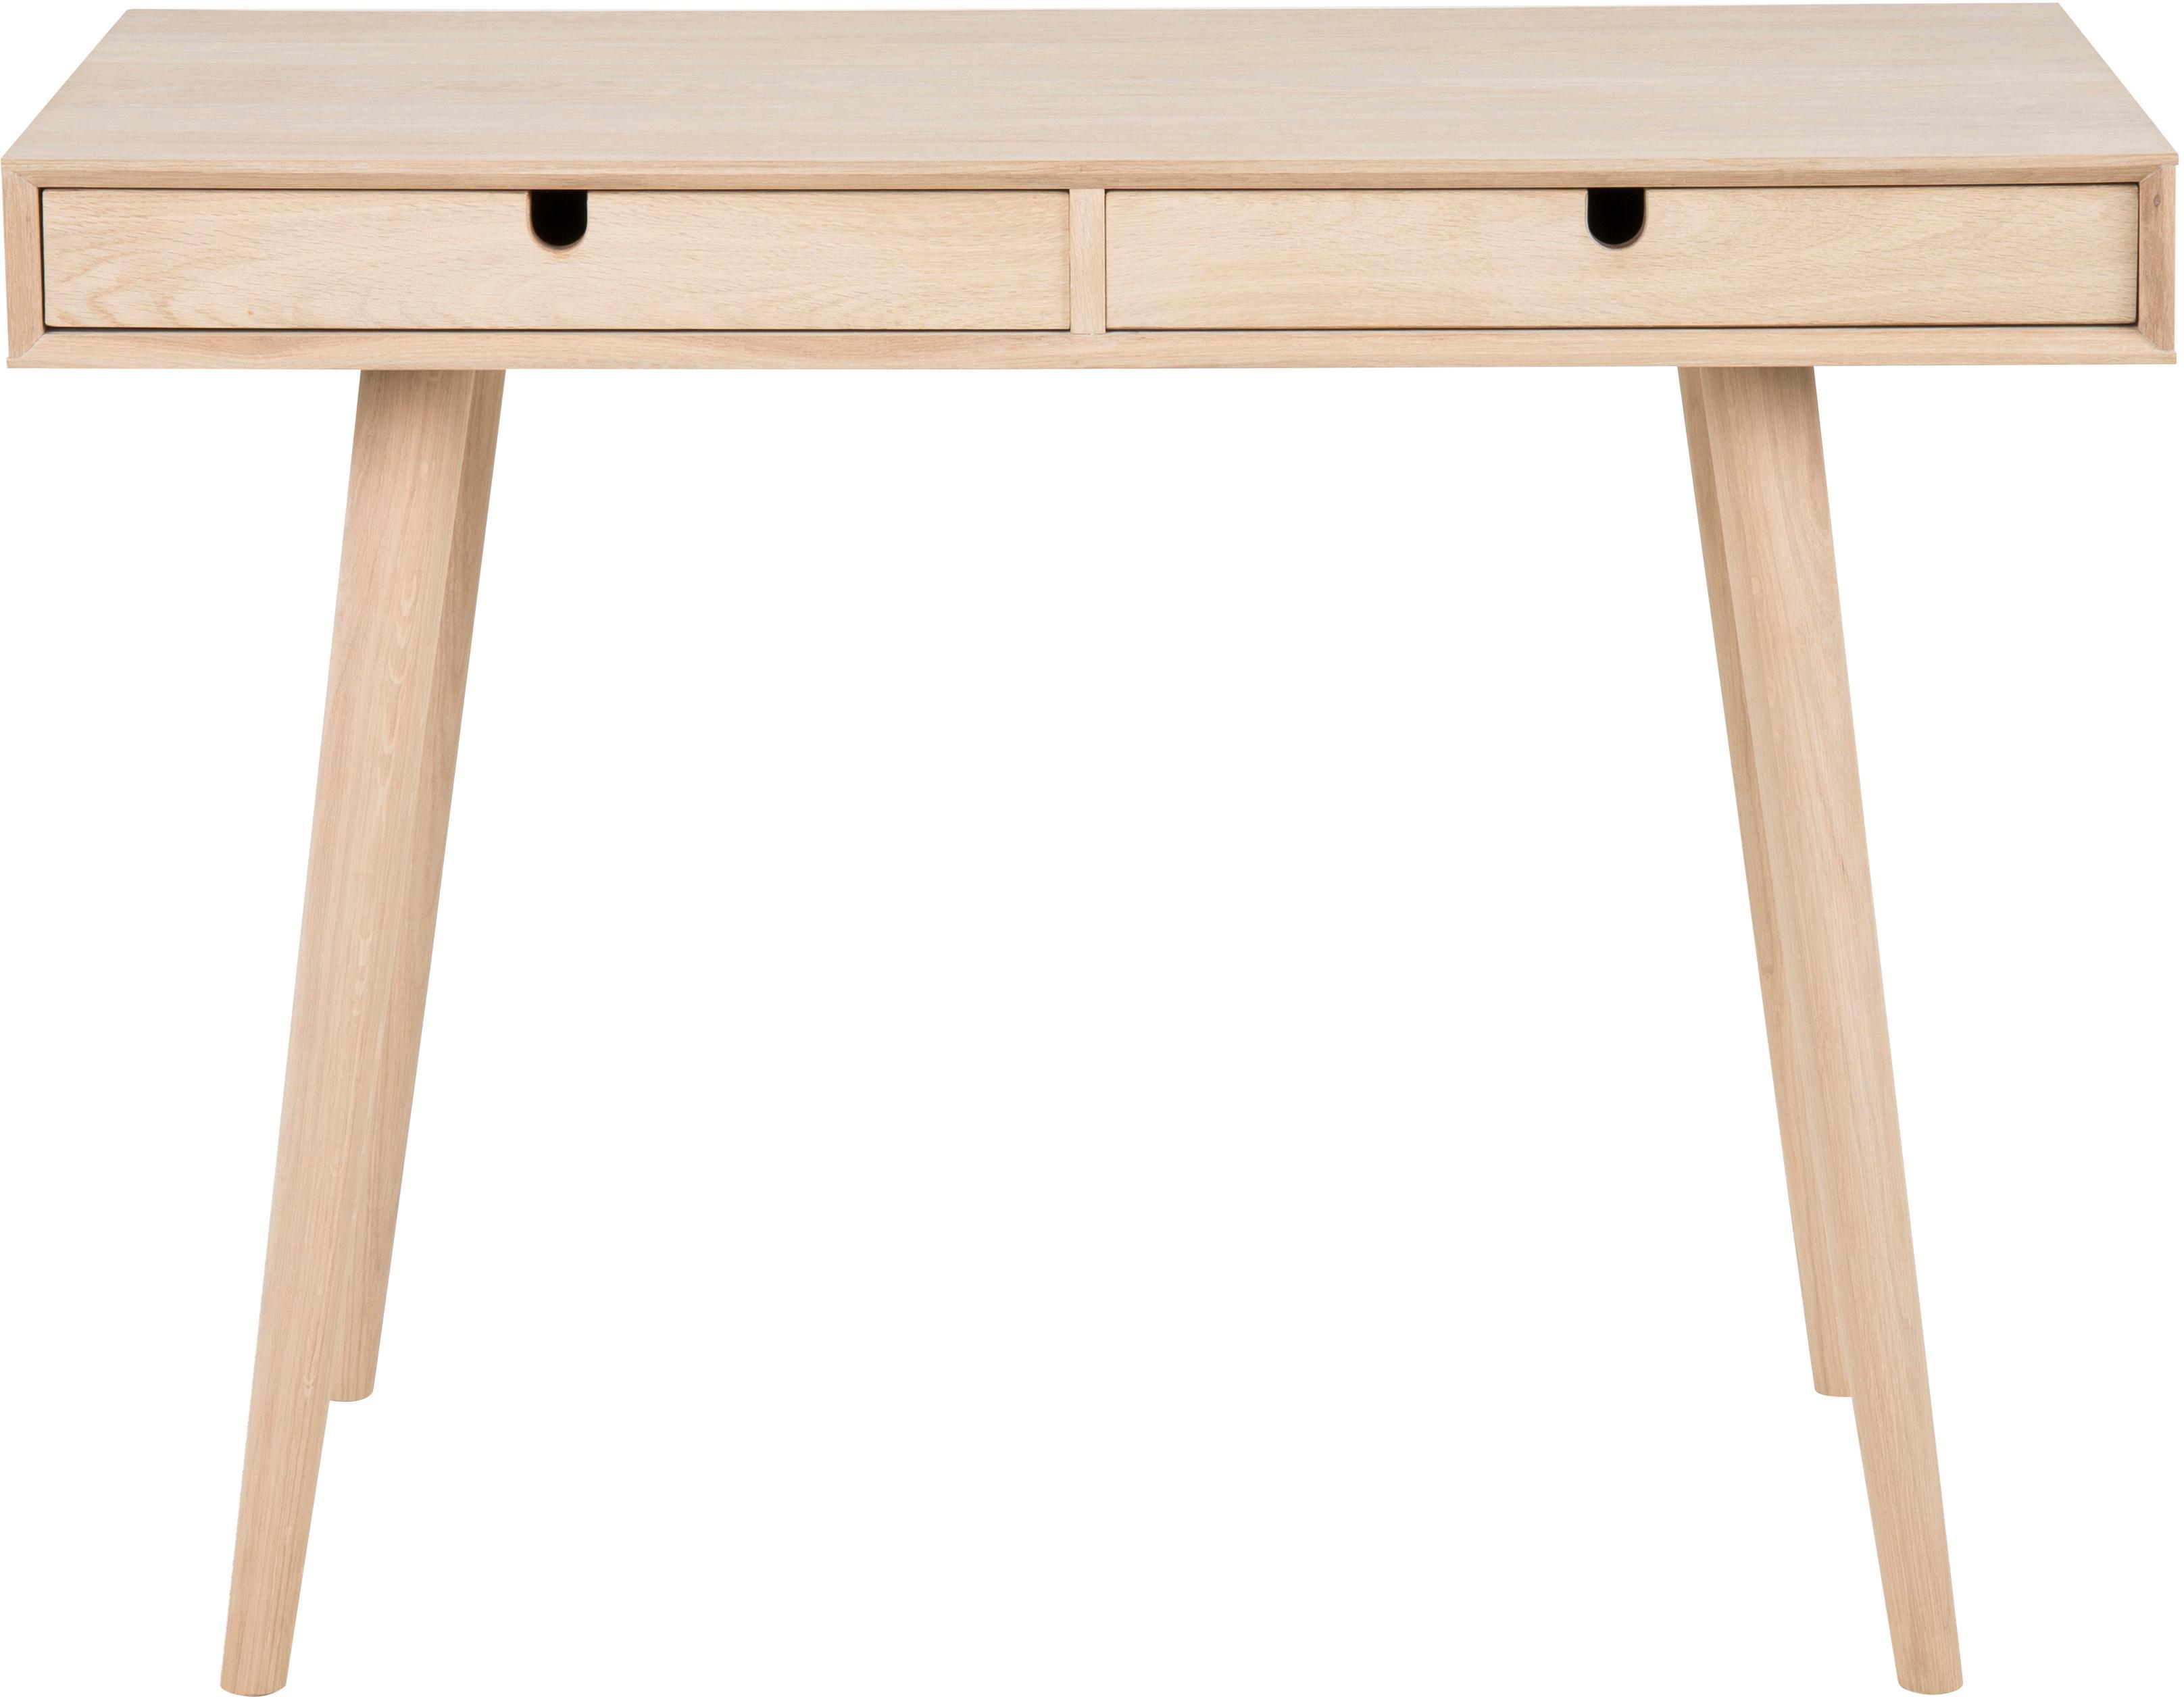 Smal bureau Century van eikenhout, Poten: eikenhout, wit gepigmente, Eikenhoutkleurig, 100 x 74 cm